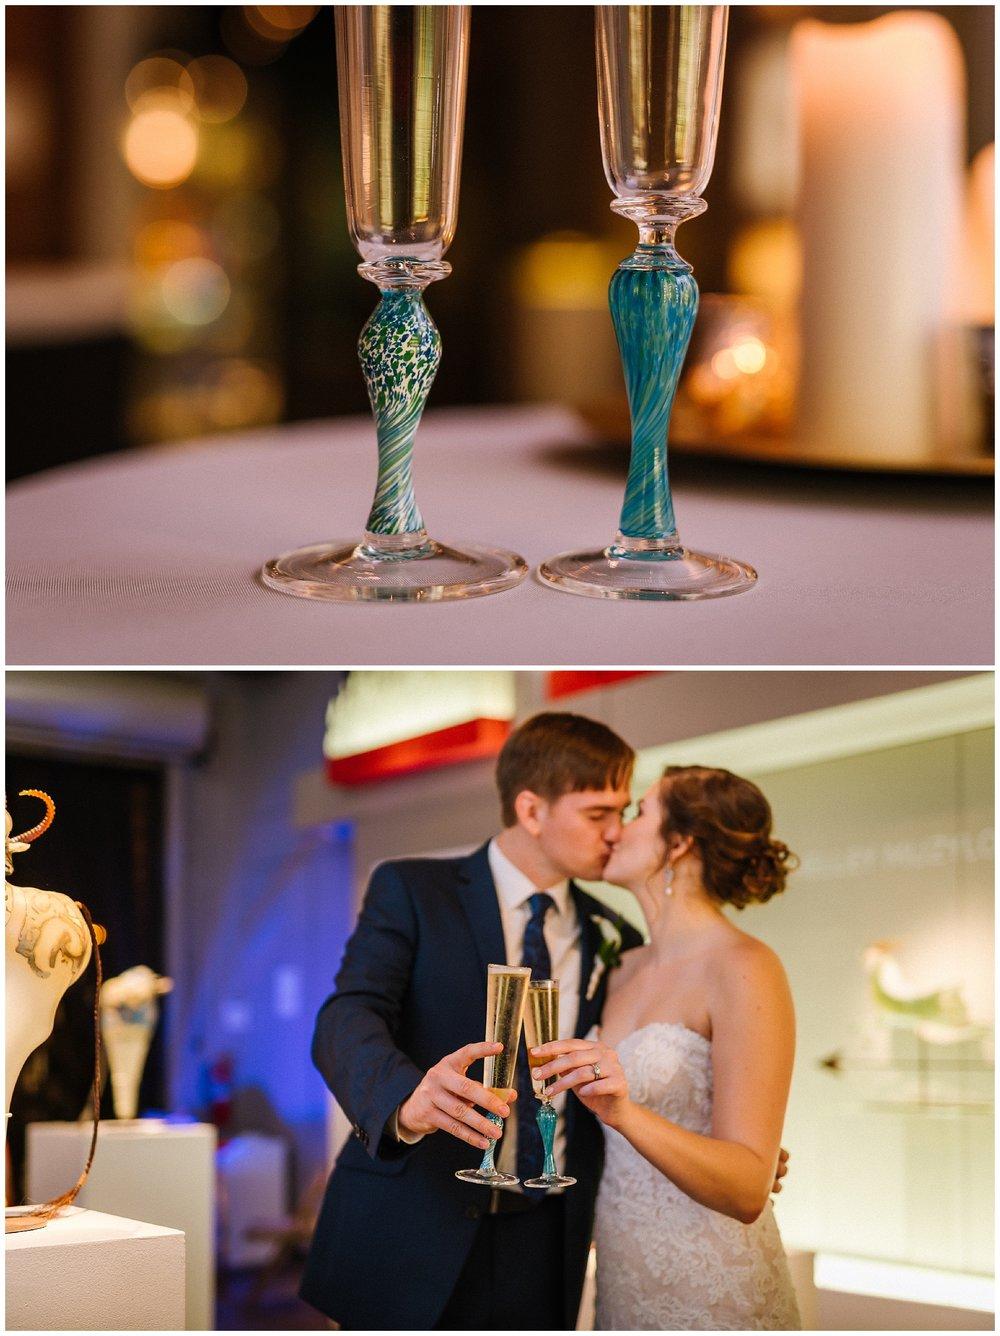 St-pete-wedding-photography-unique-glass-blowing-gallery-succulent-art_0037.jpg